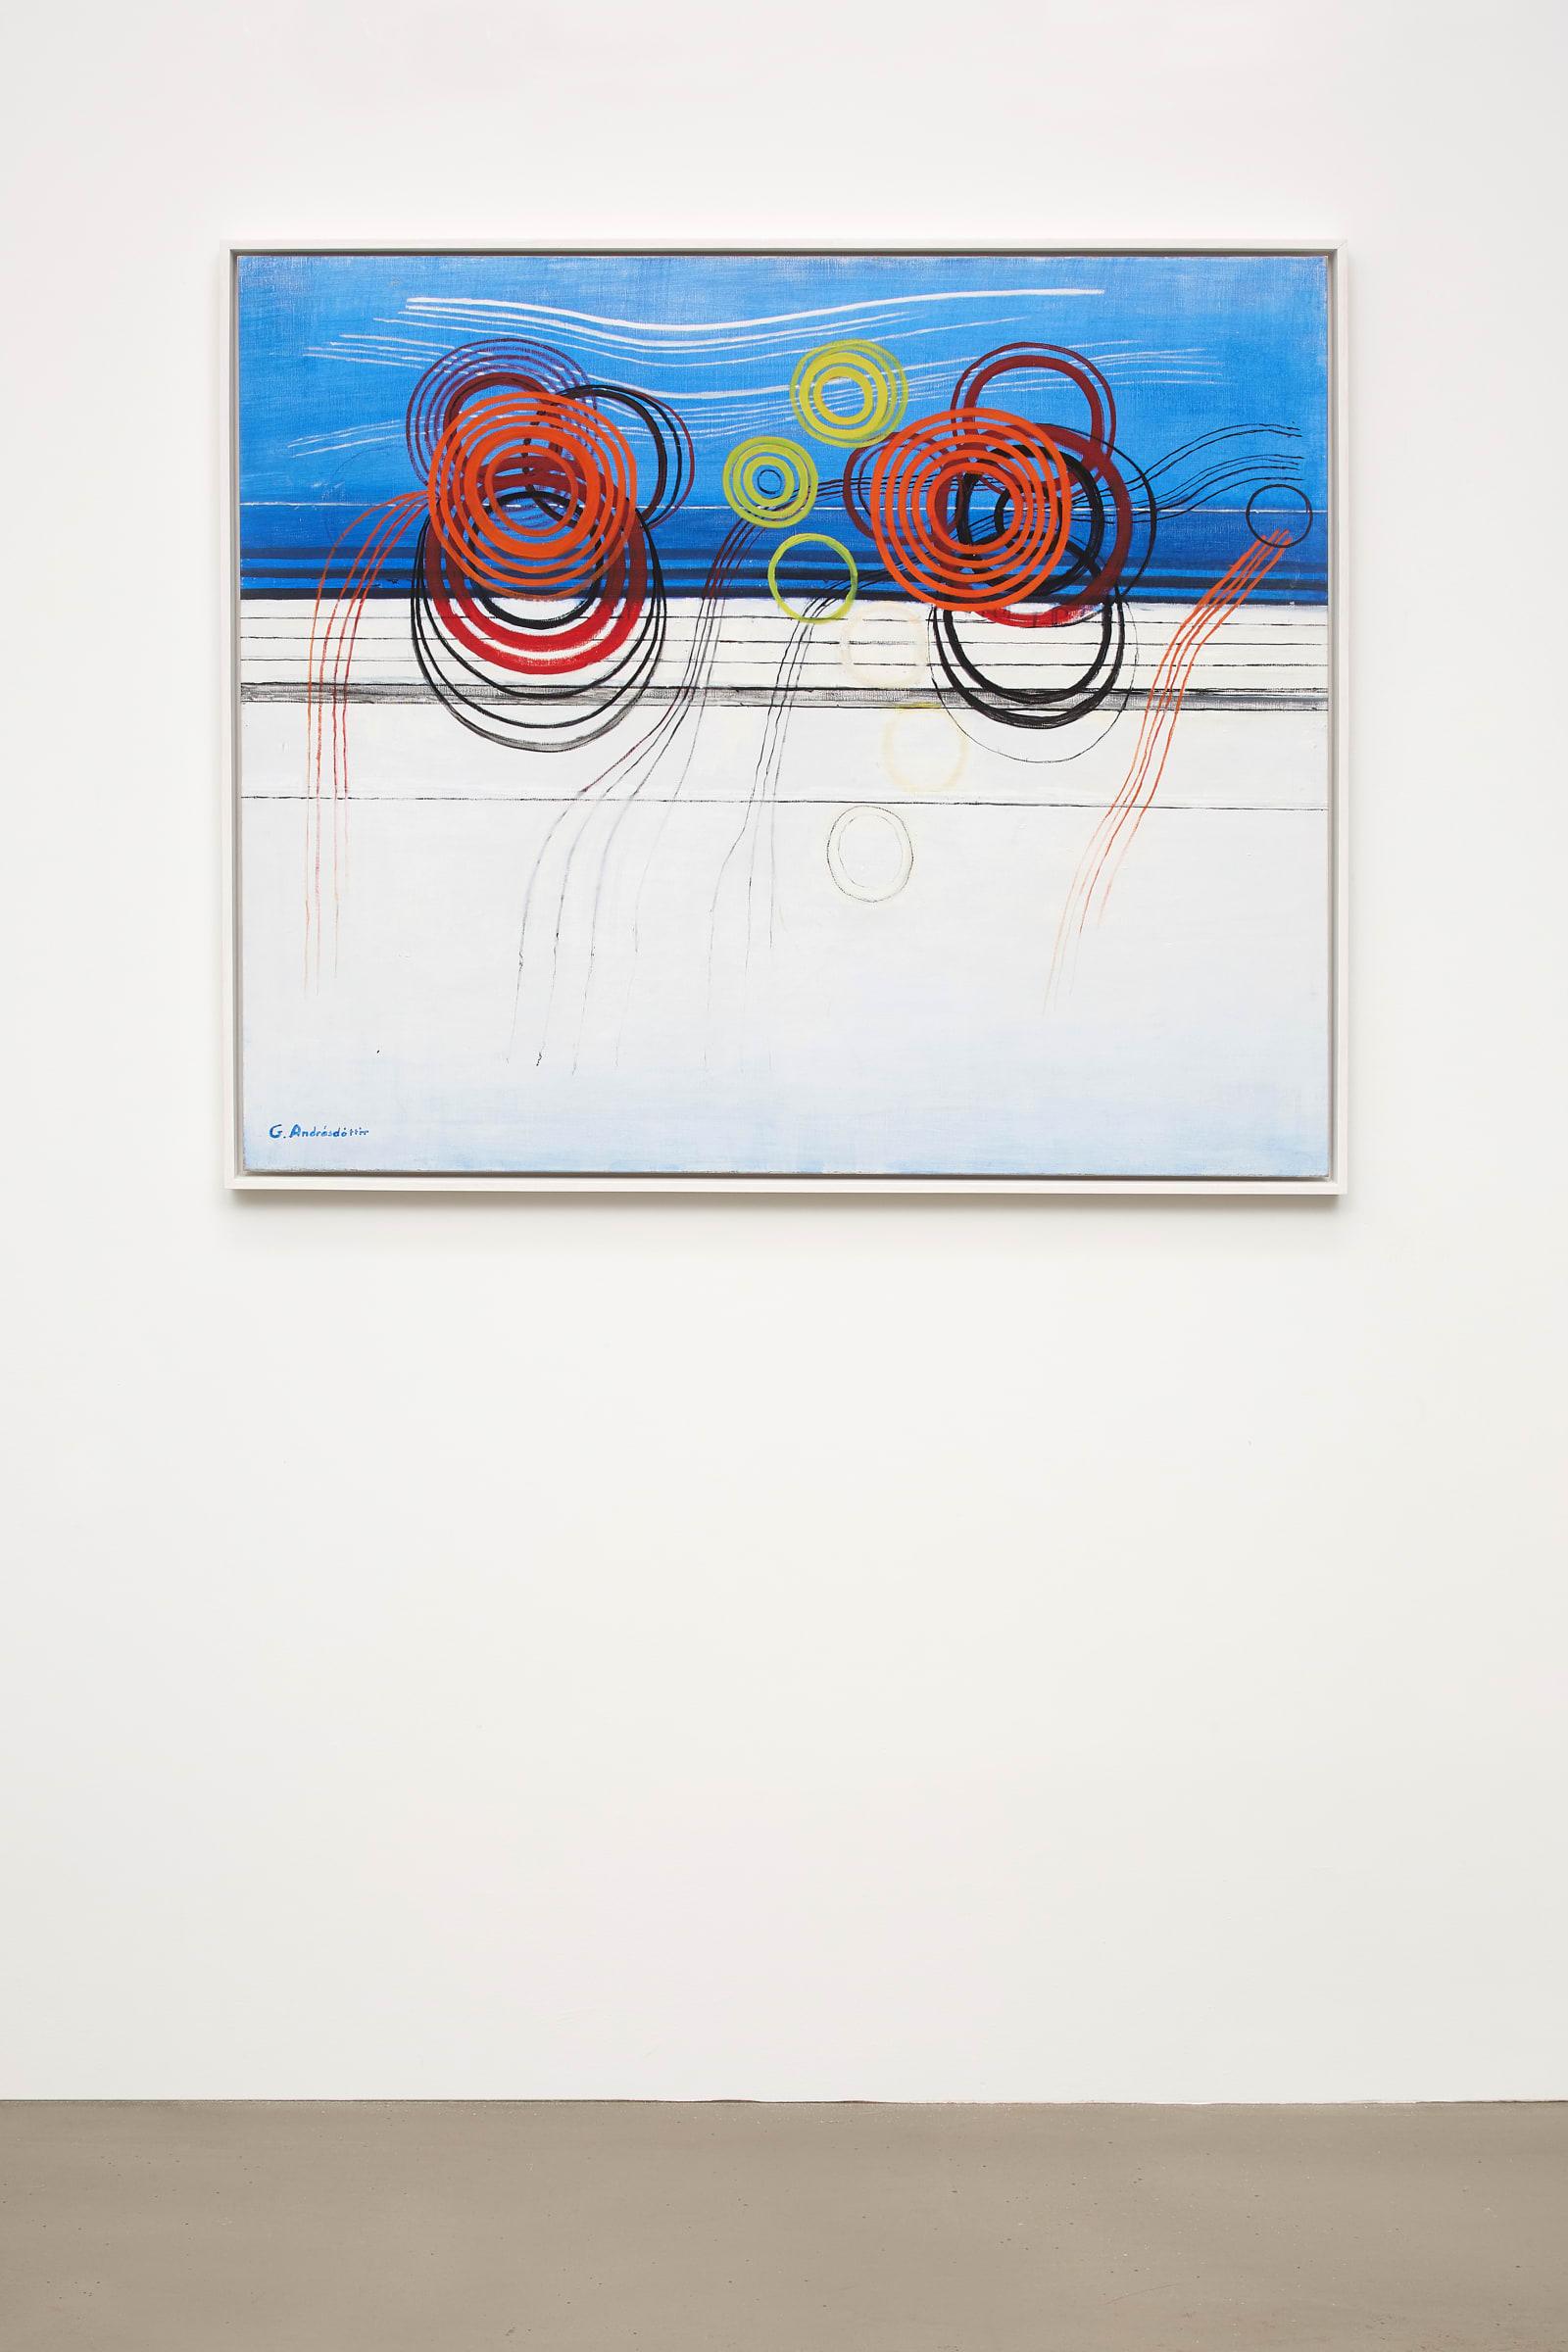 "<span class=""link fancybox-details-link""><a href=""/exhibitions/163/works/artworks14728/"">View Detail Page</a></span><div class=""artist""><strong>Guðmunda Andrésdóttir</strong></div><div class=""title""><em>Án titils</em>, 1971-1972</div><div class=""signed_and_dated"">signed on front</div><div class=""medium"">oil on canvas</div><div class=""dimensions"">90 x 105,5 cm <br>framed: 93,5 x 107 cm</div>"